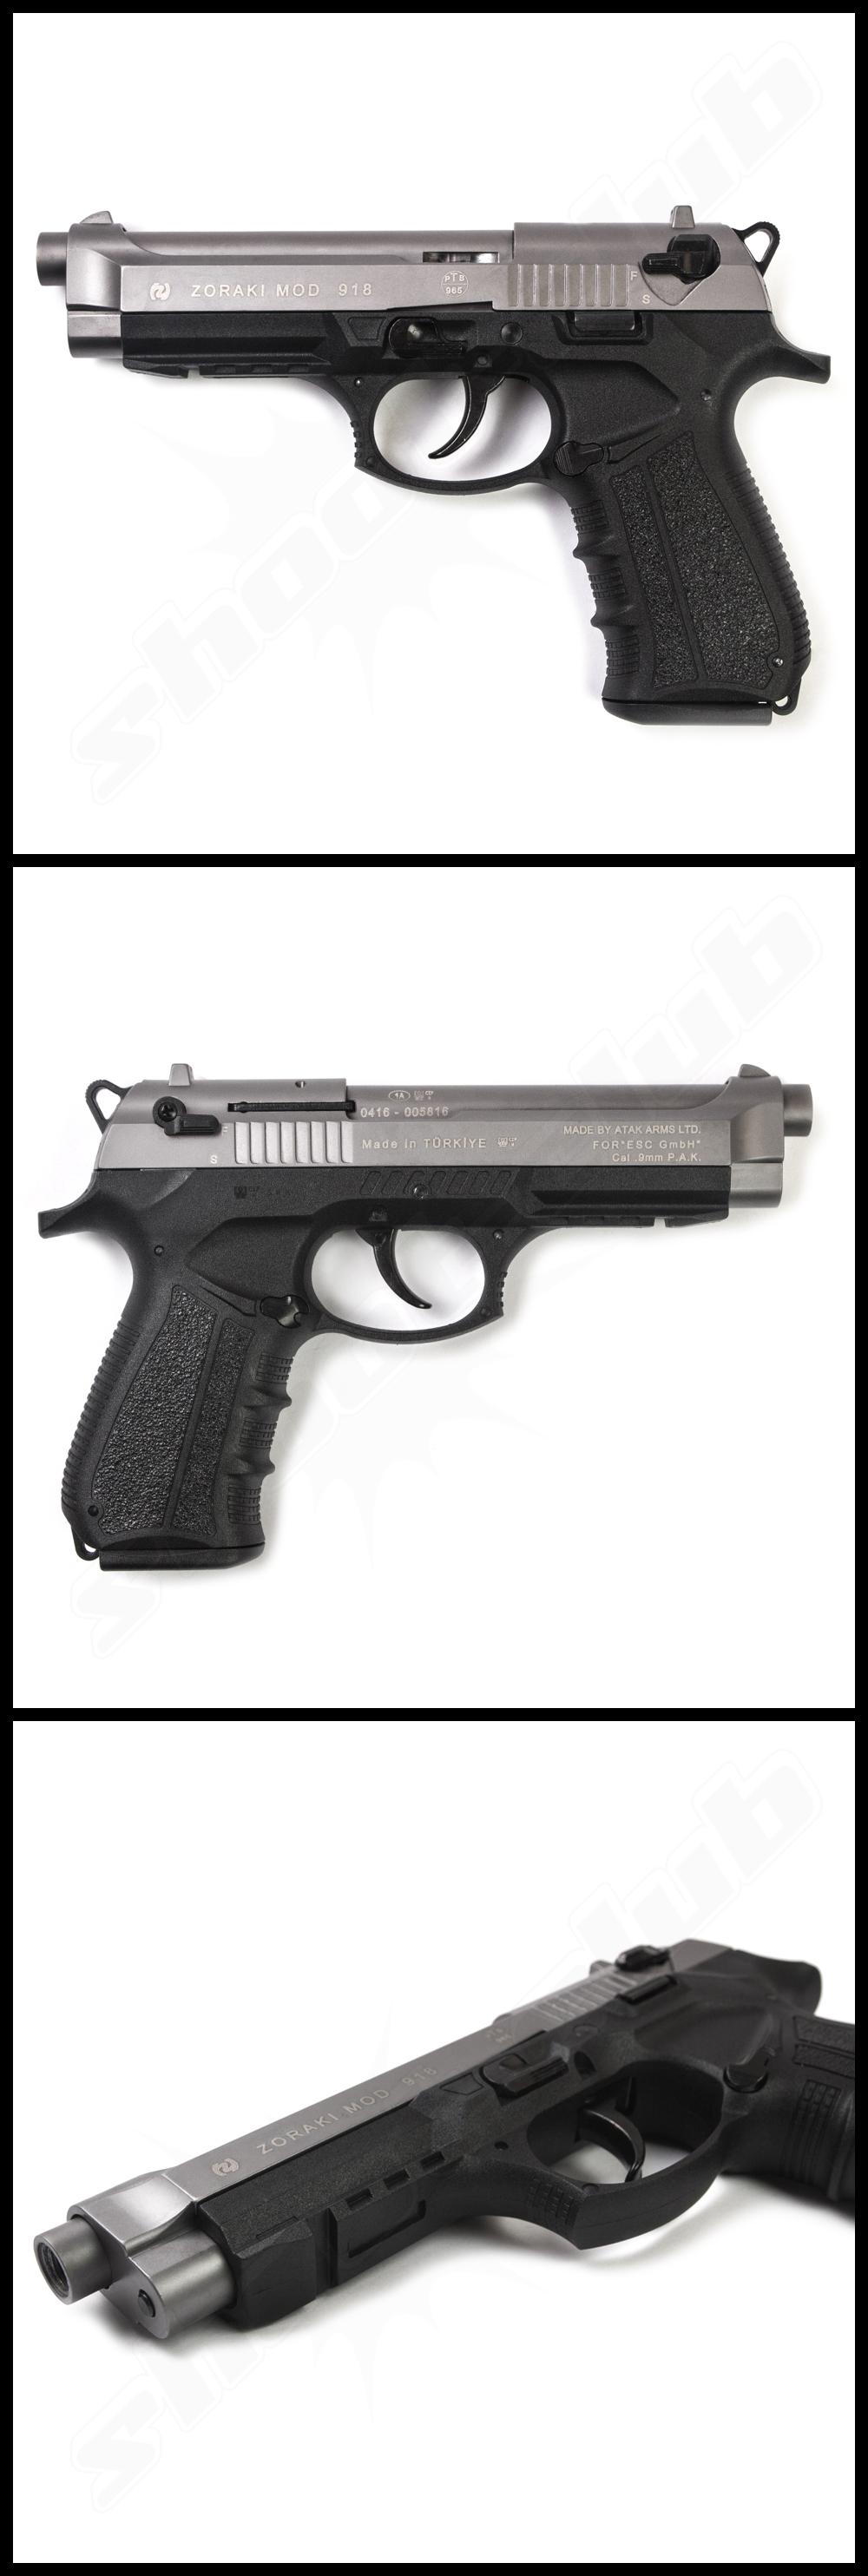 Schreckschusspistole Zoraki 918 Titan im Kal. 9mm P.A.K.  #shootclub #schreckschuss #Pistol